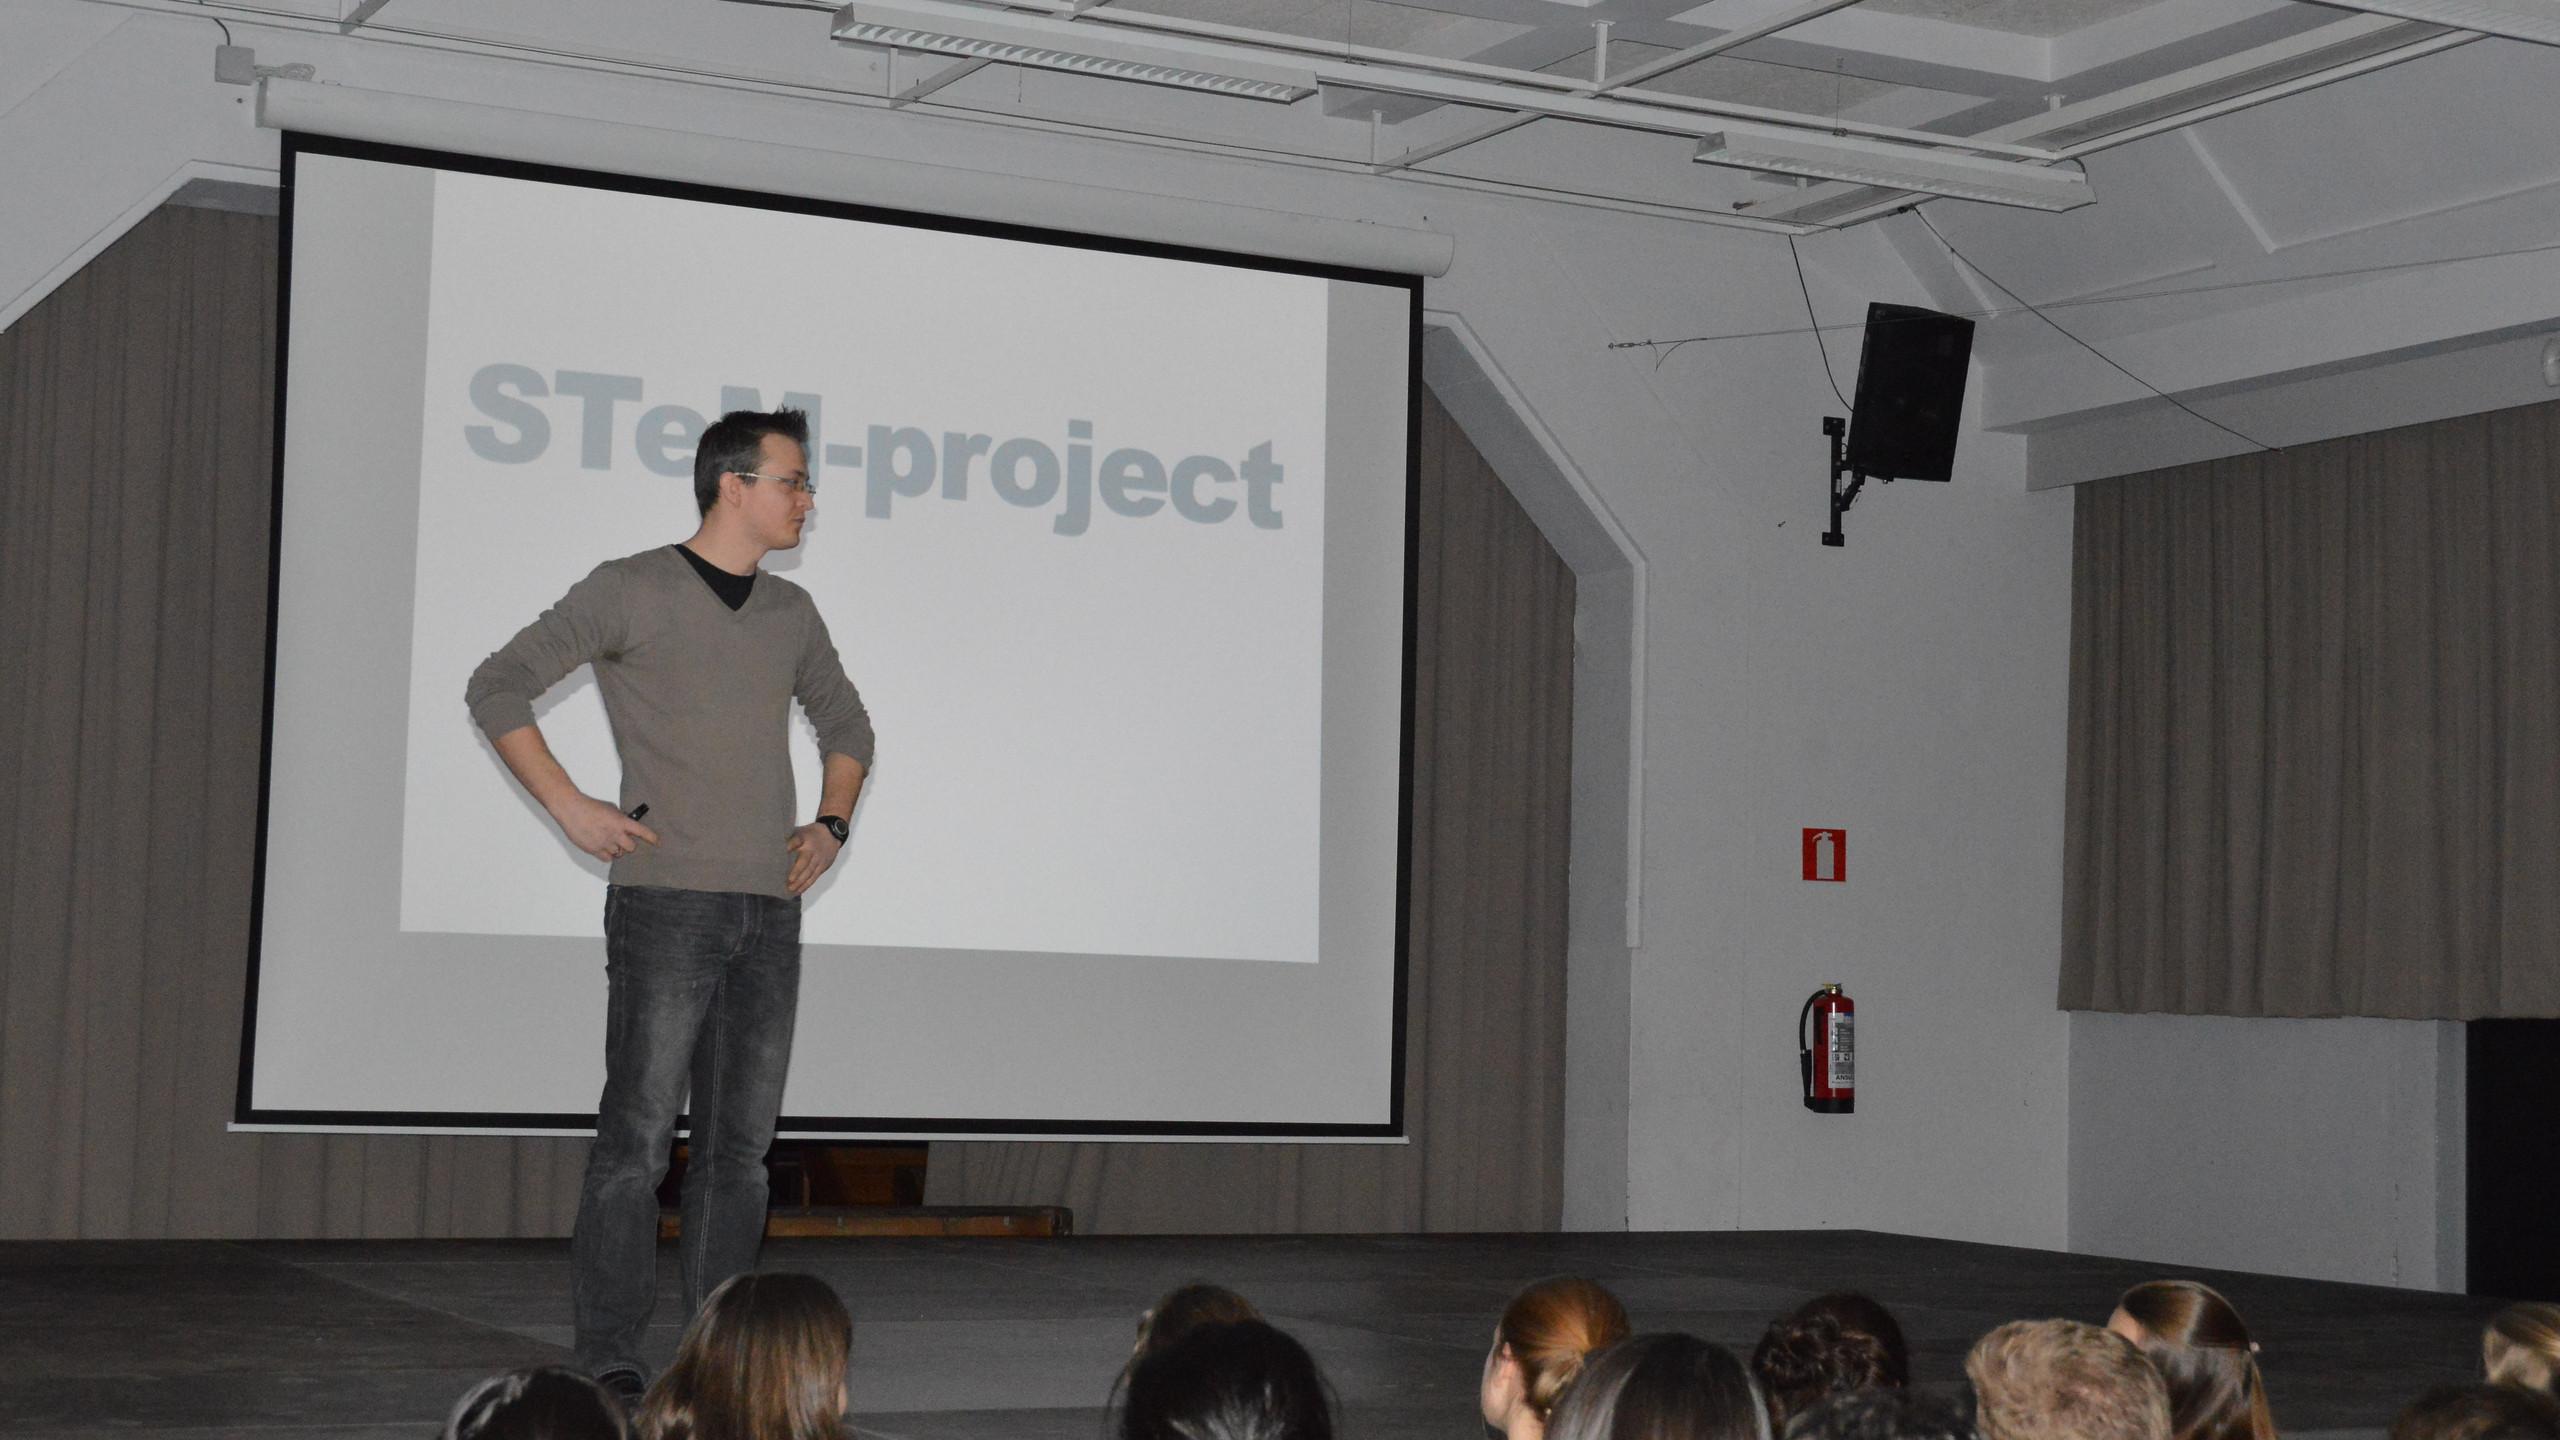 SteM-project